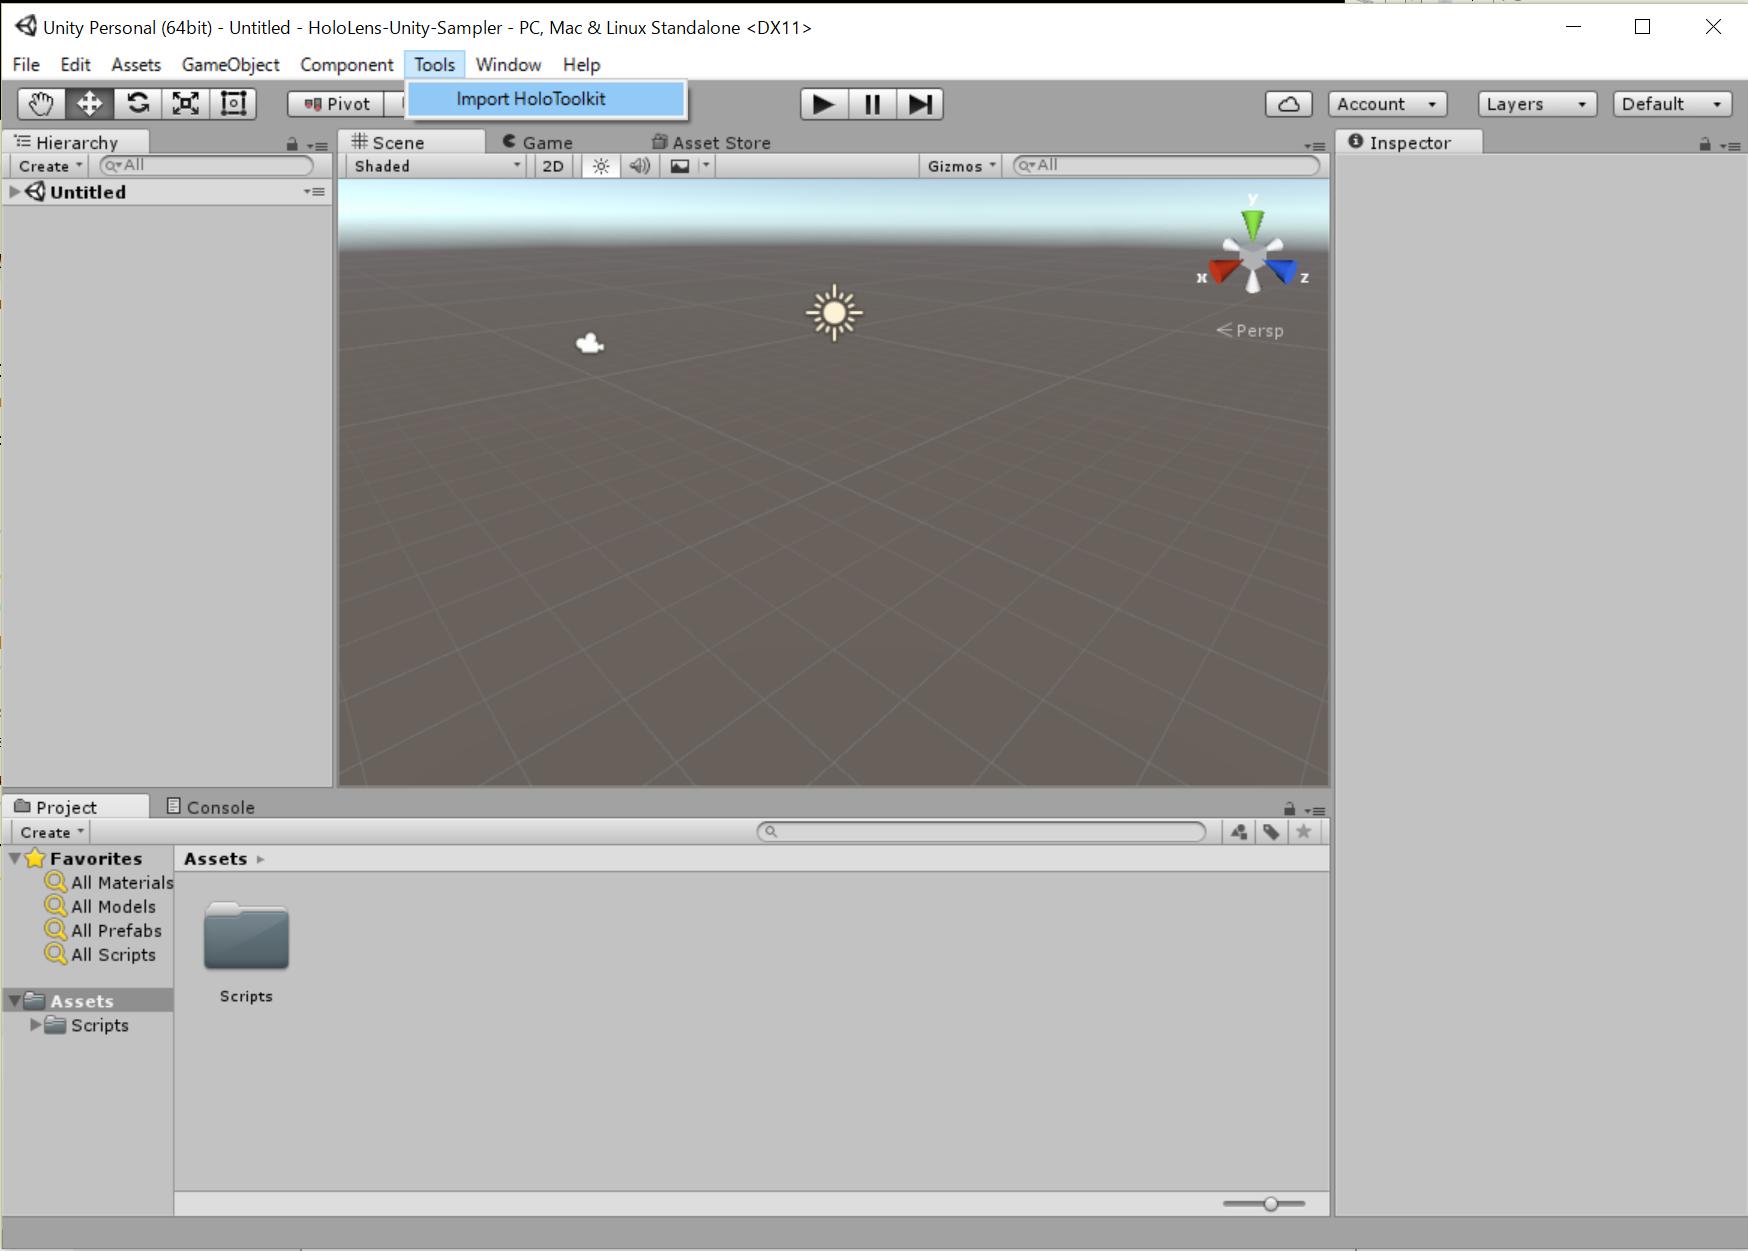 https://raw.githubusercontent.com/wiki/KzoNag/HoloLens-Unity-Sampler/image/screenshot/ss_importholotoolkit.png